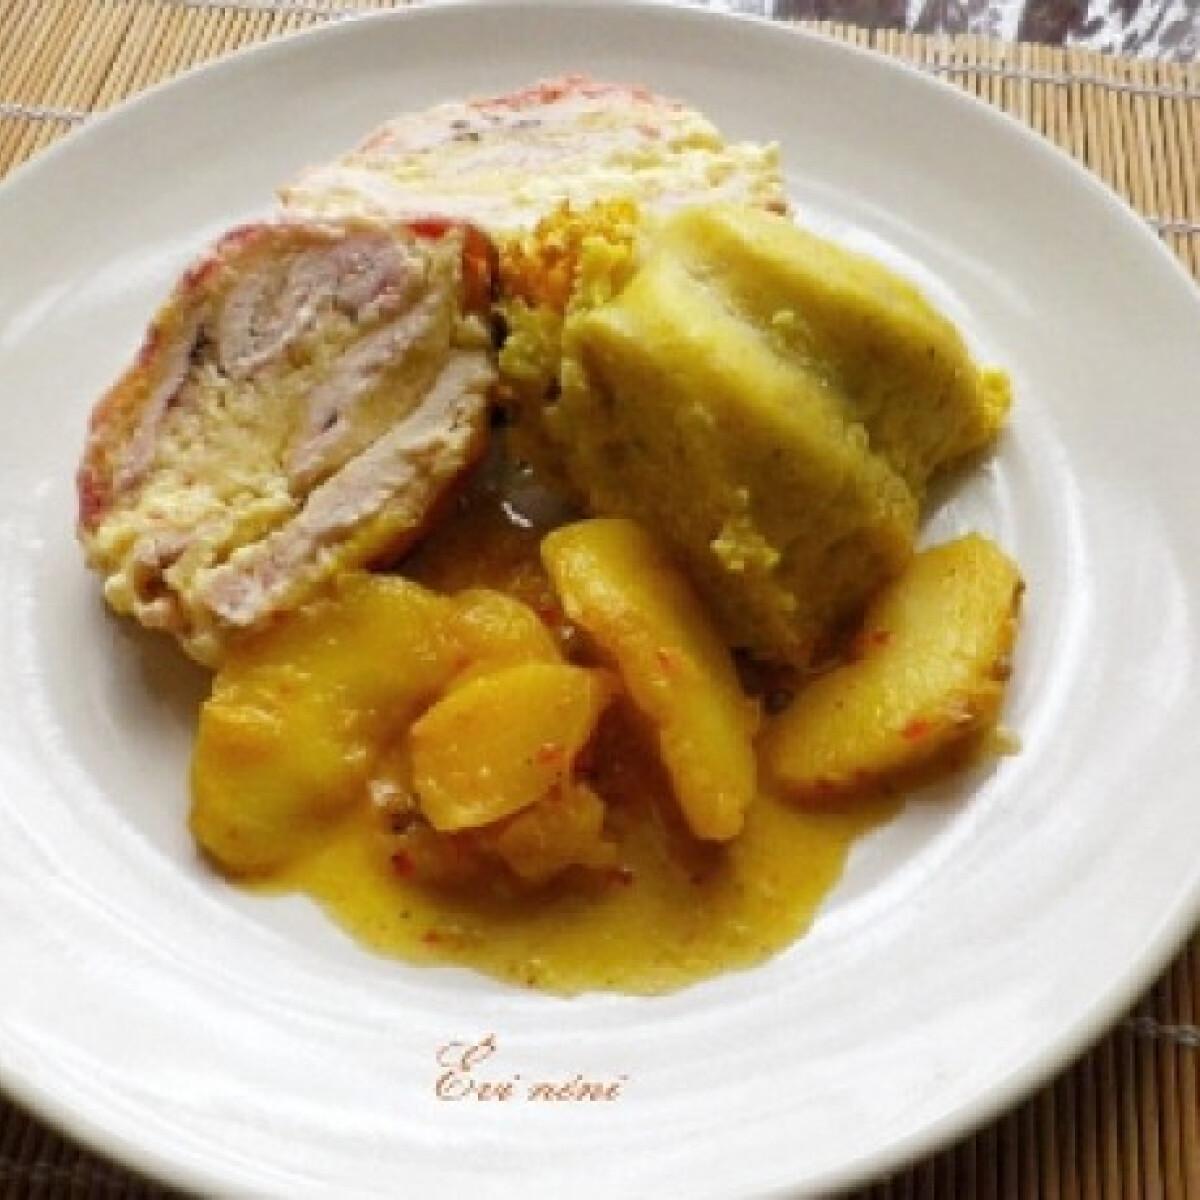 Sajtos csirke őzgerincben sütve almaszósszal